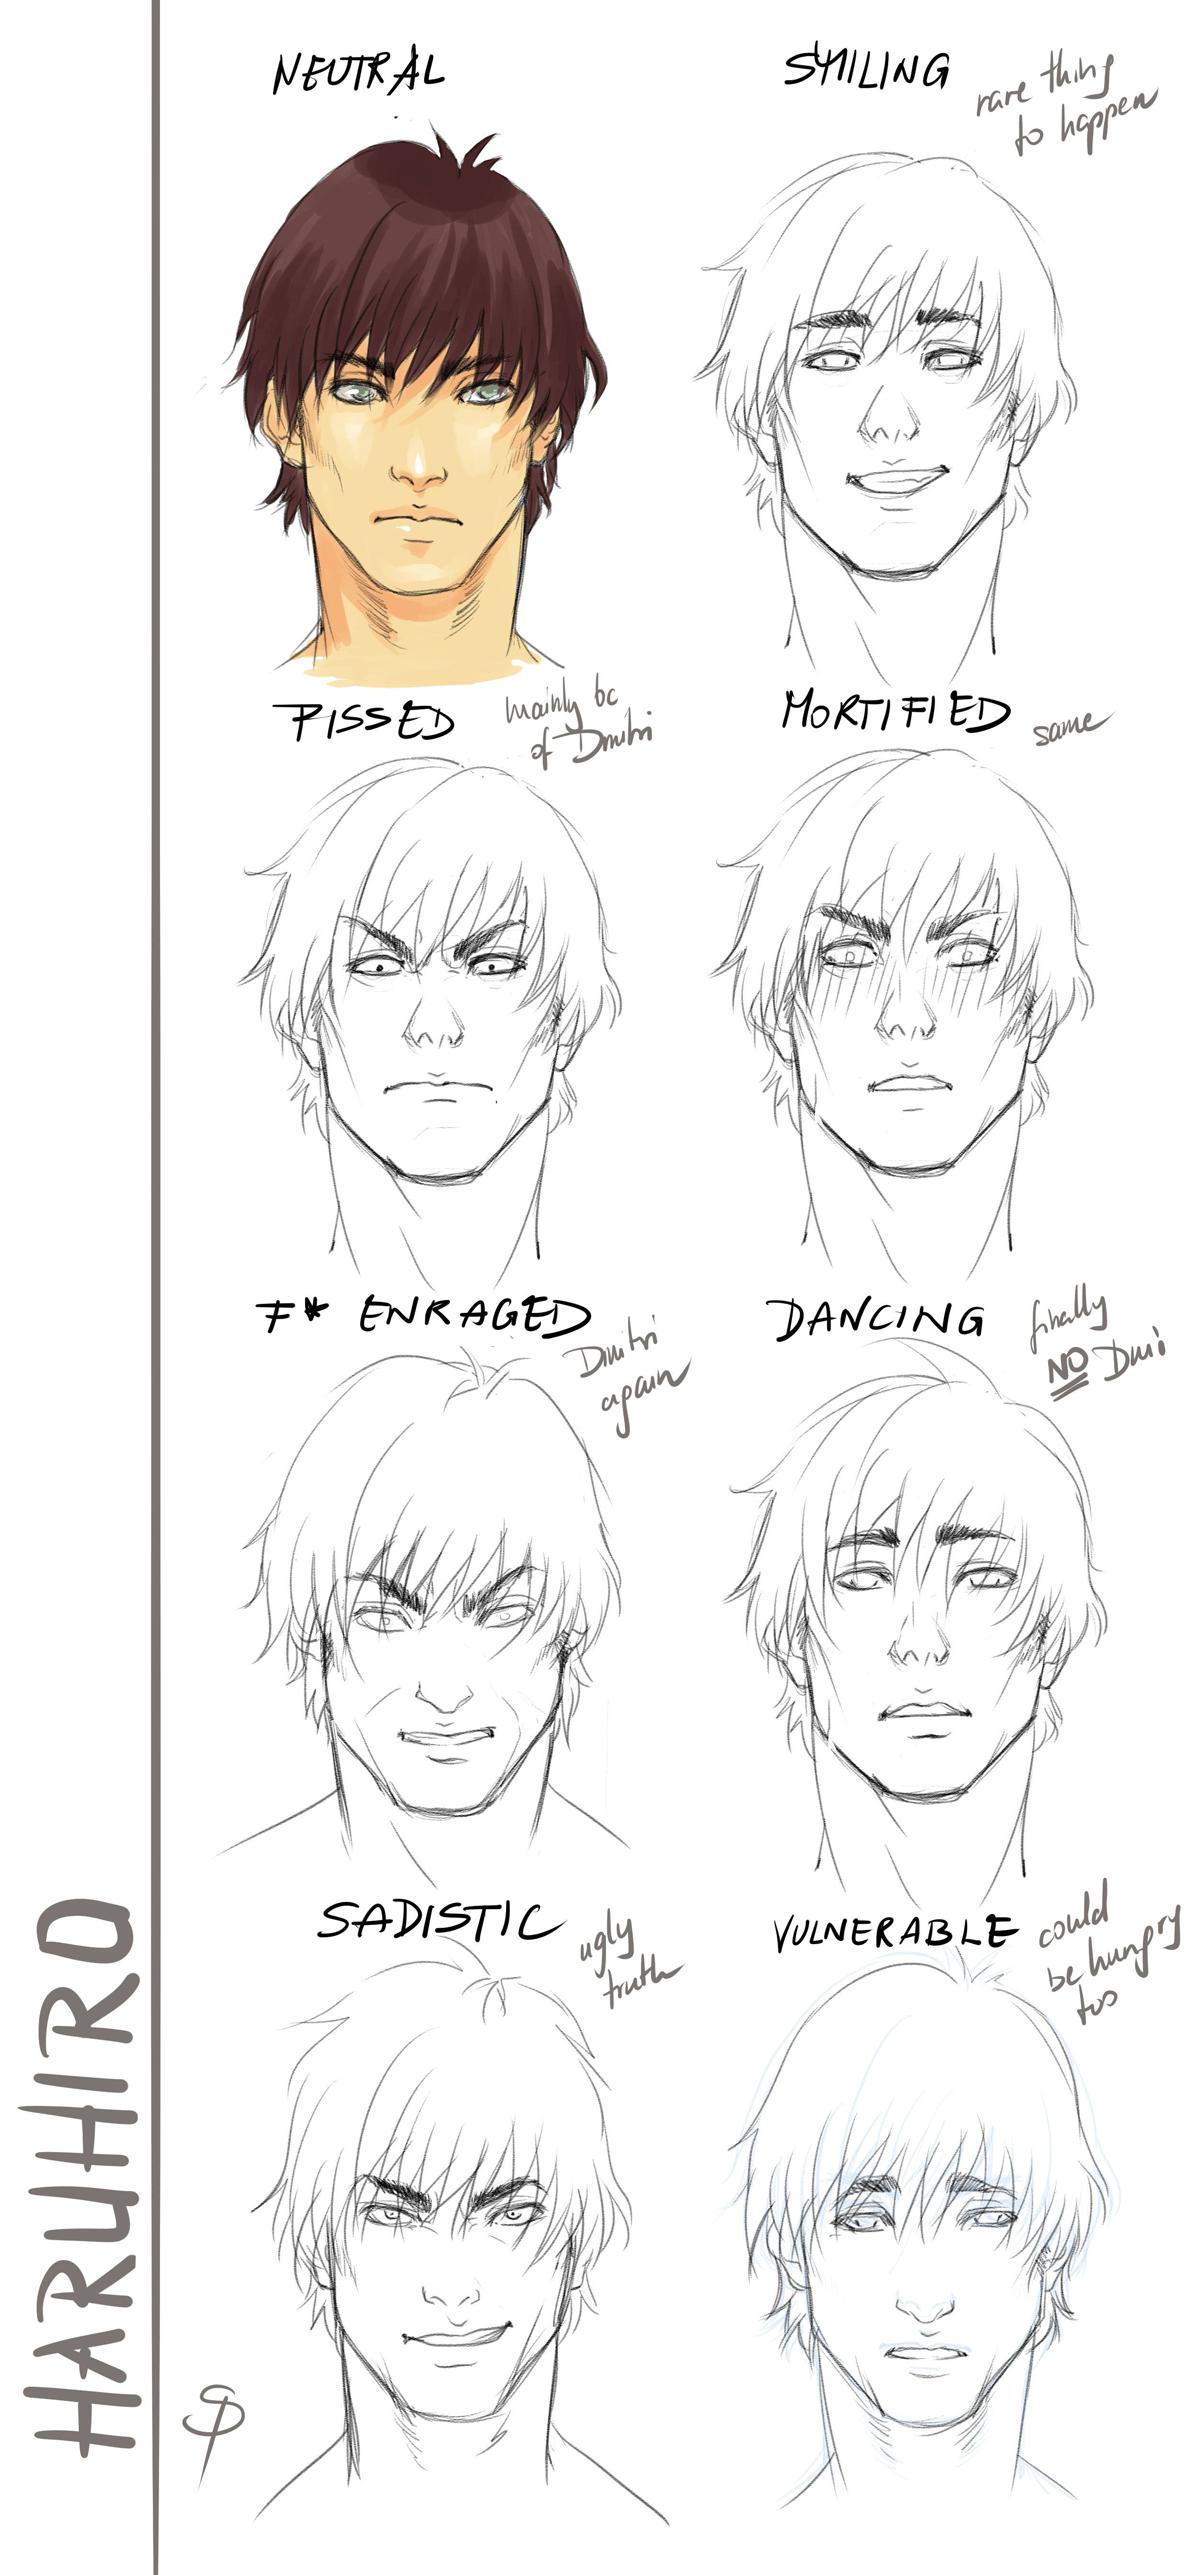 Haruhiro expressions